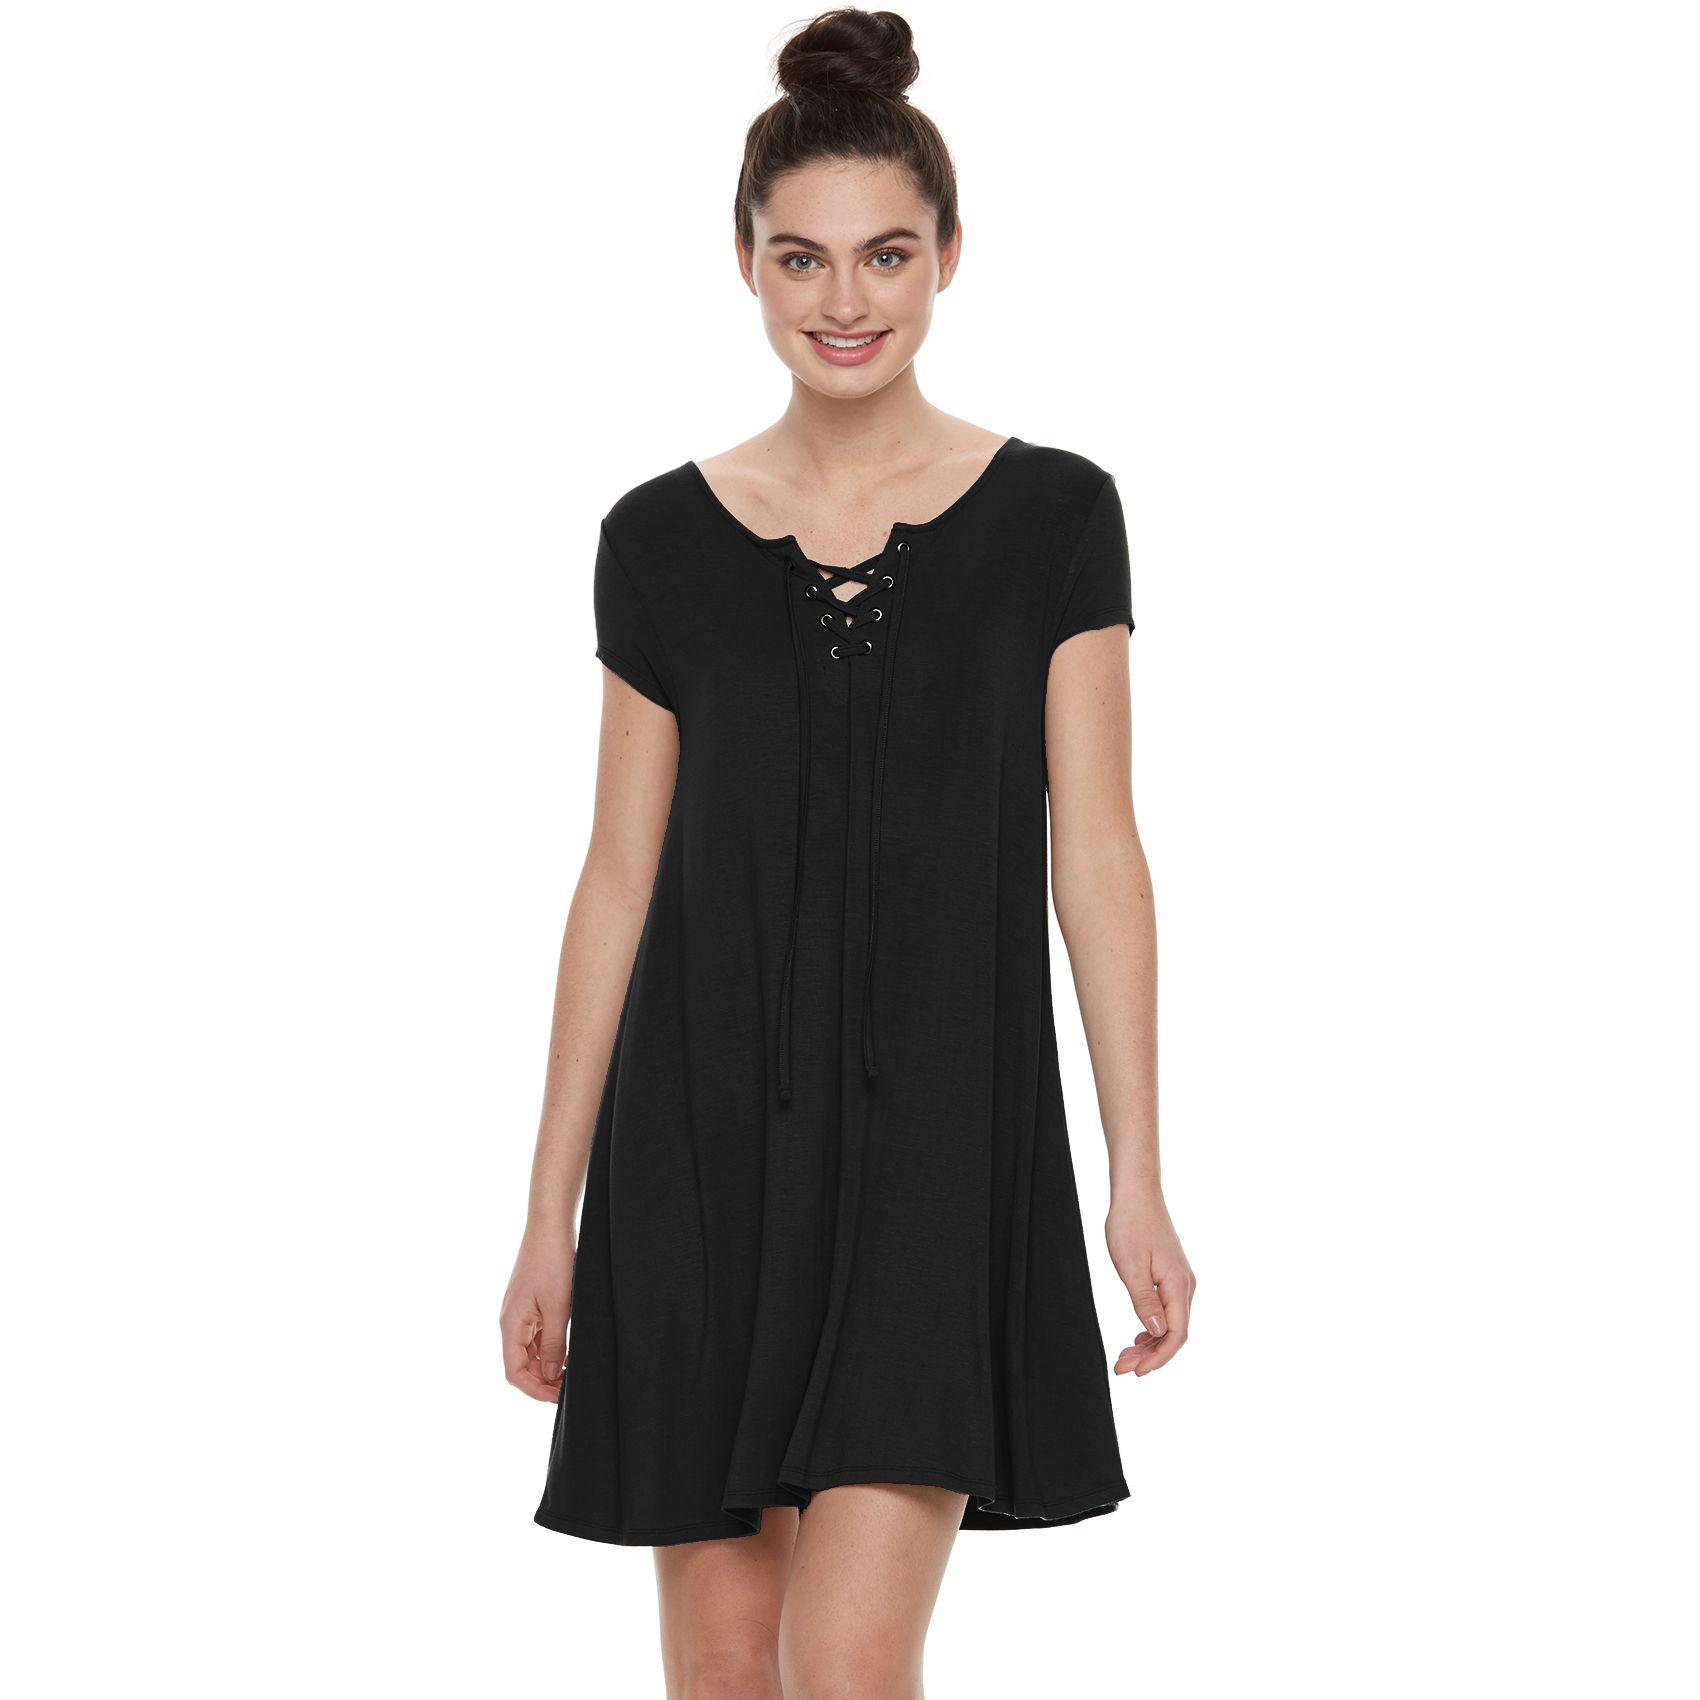 Black lace dress for juniors